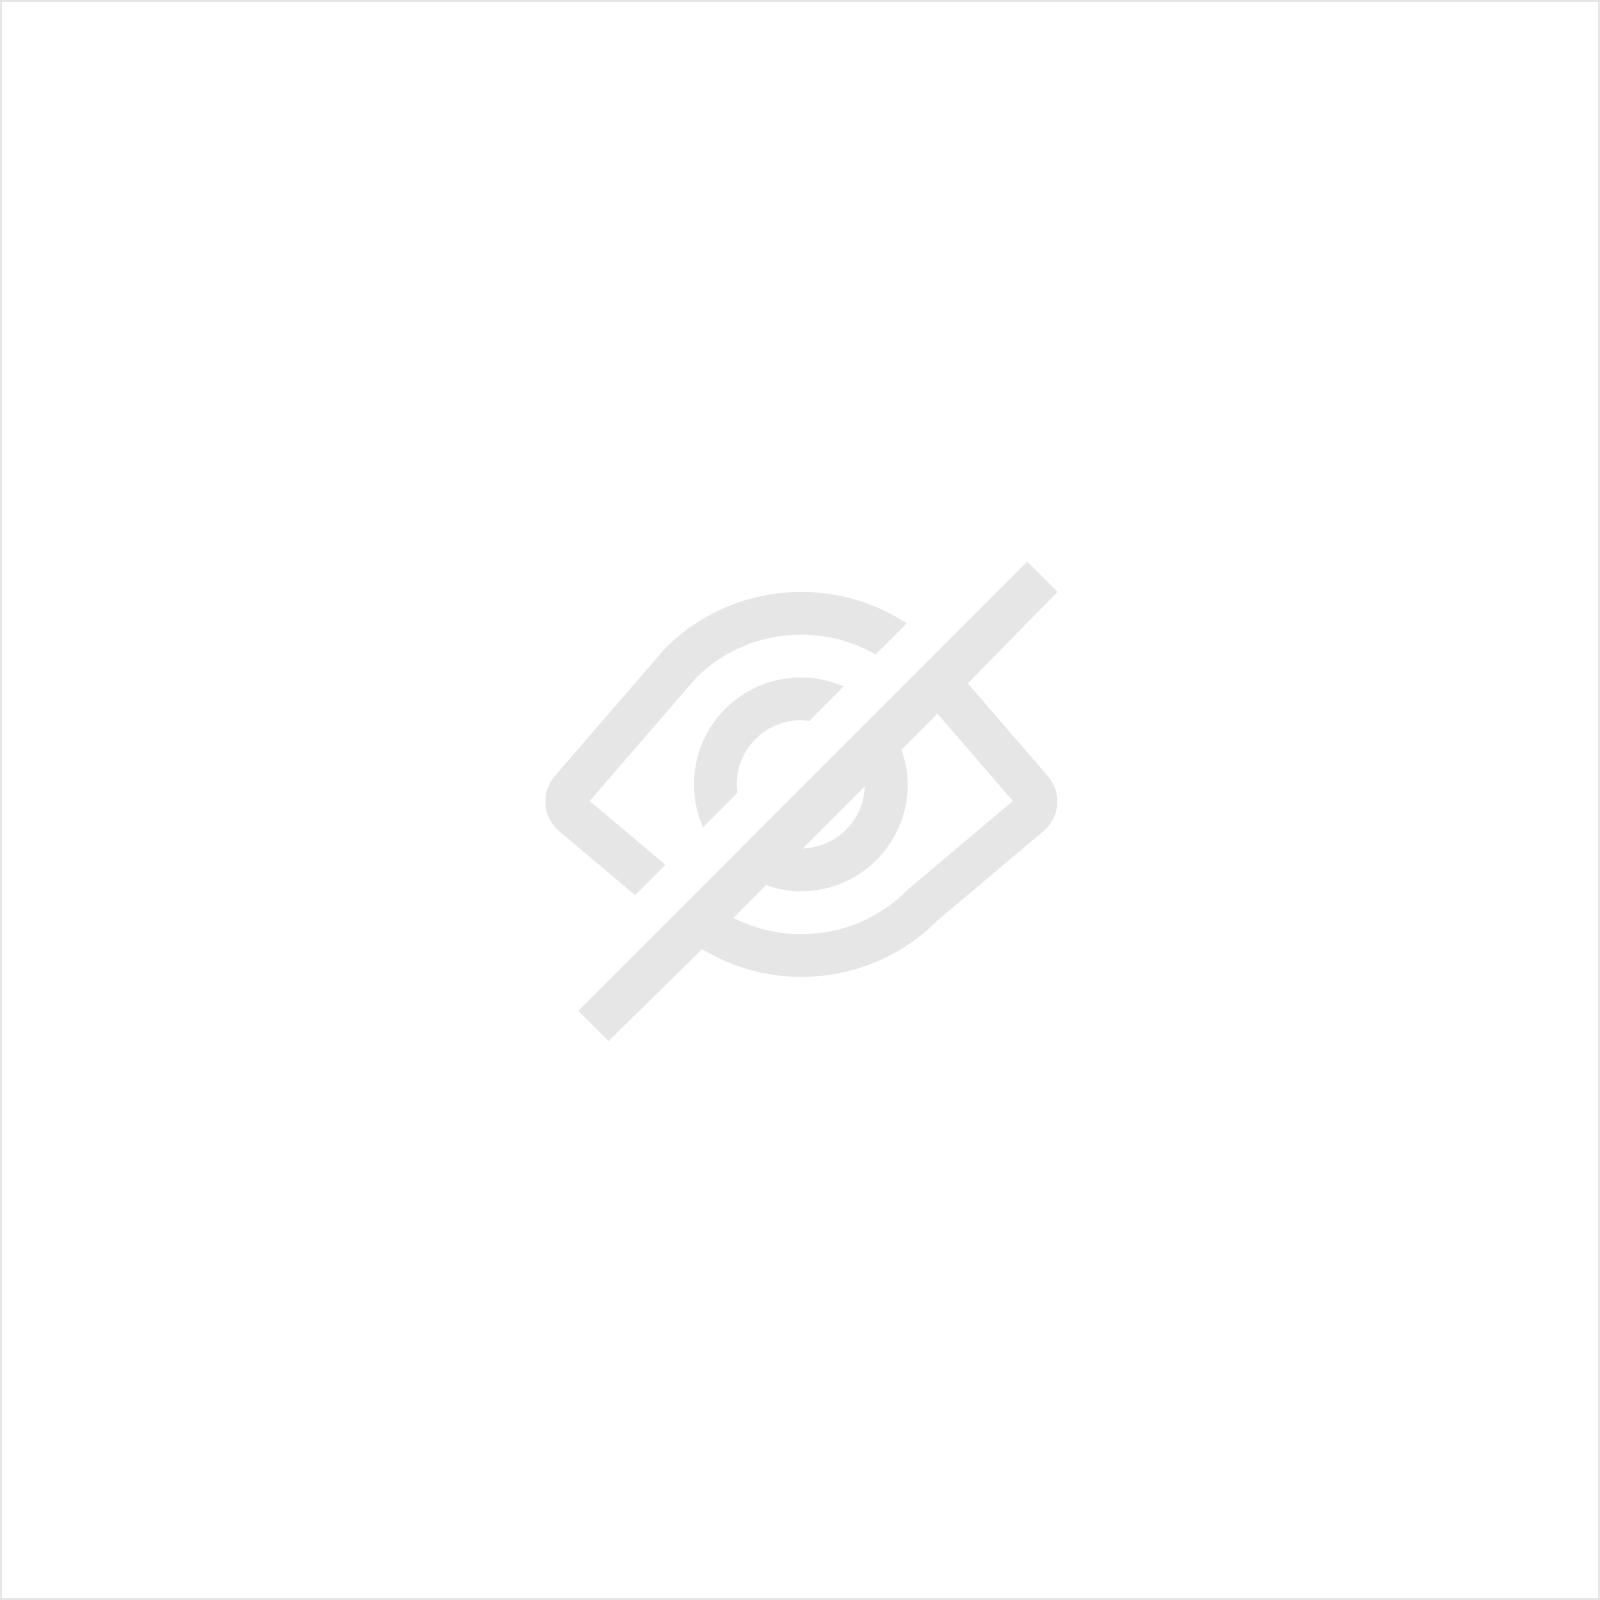 GEREEDSCHAPSKOFFER  XL 8 LADEN